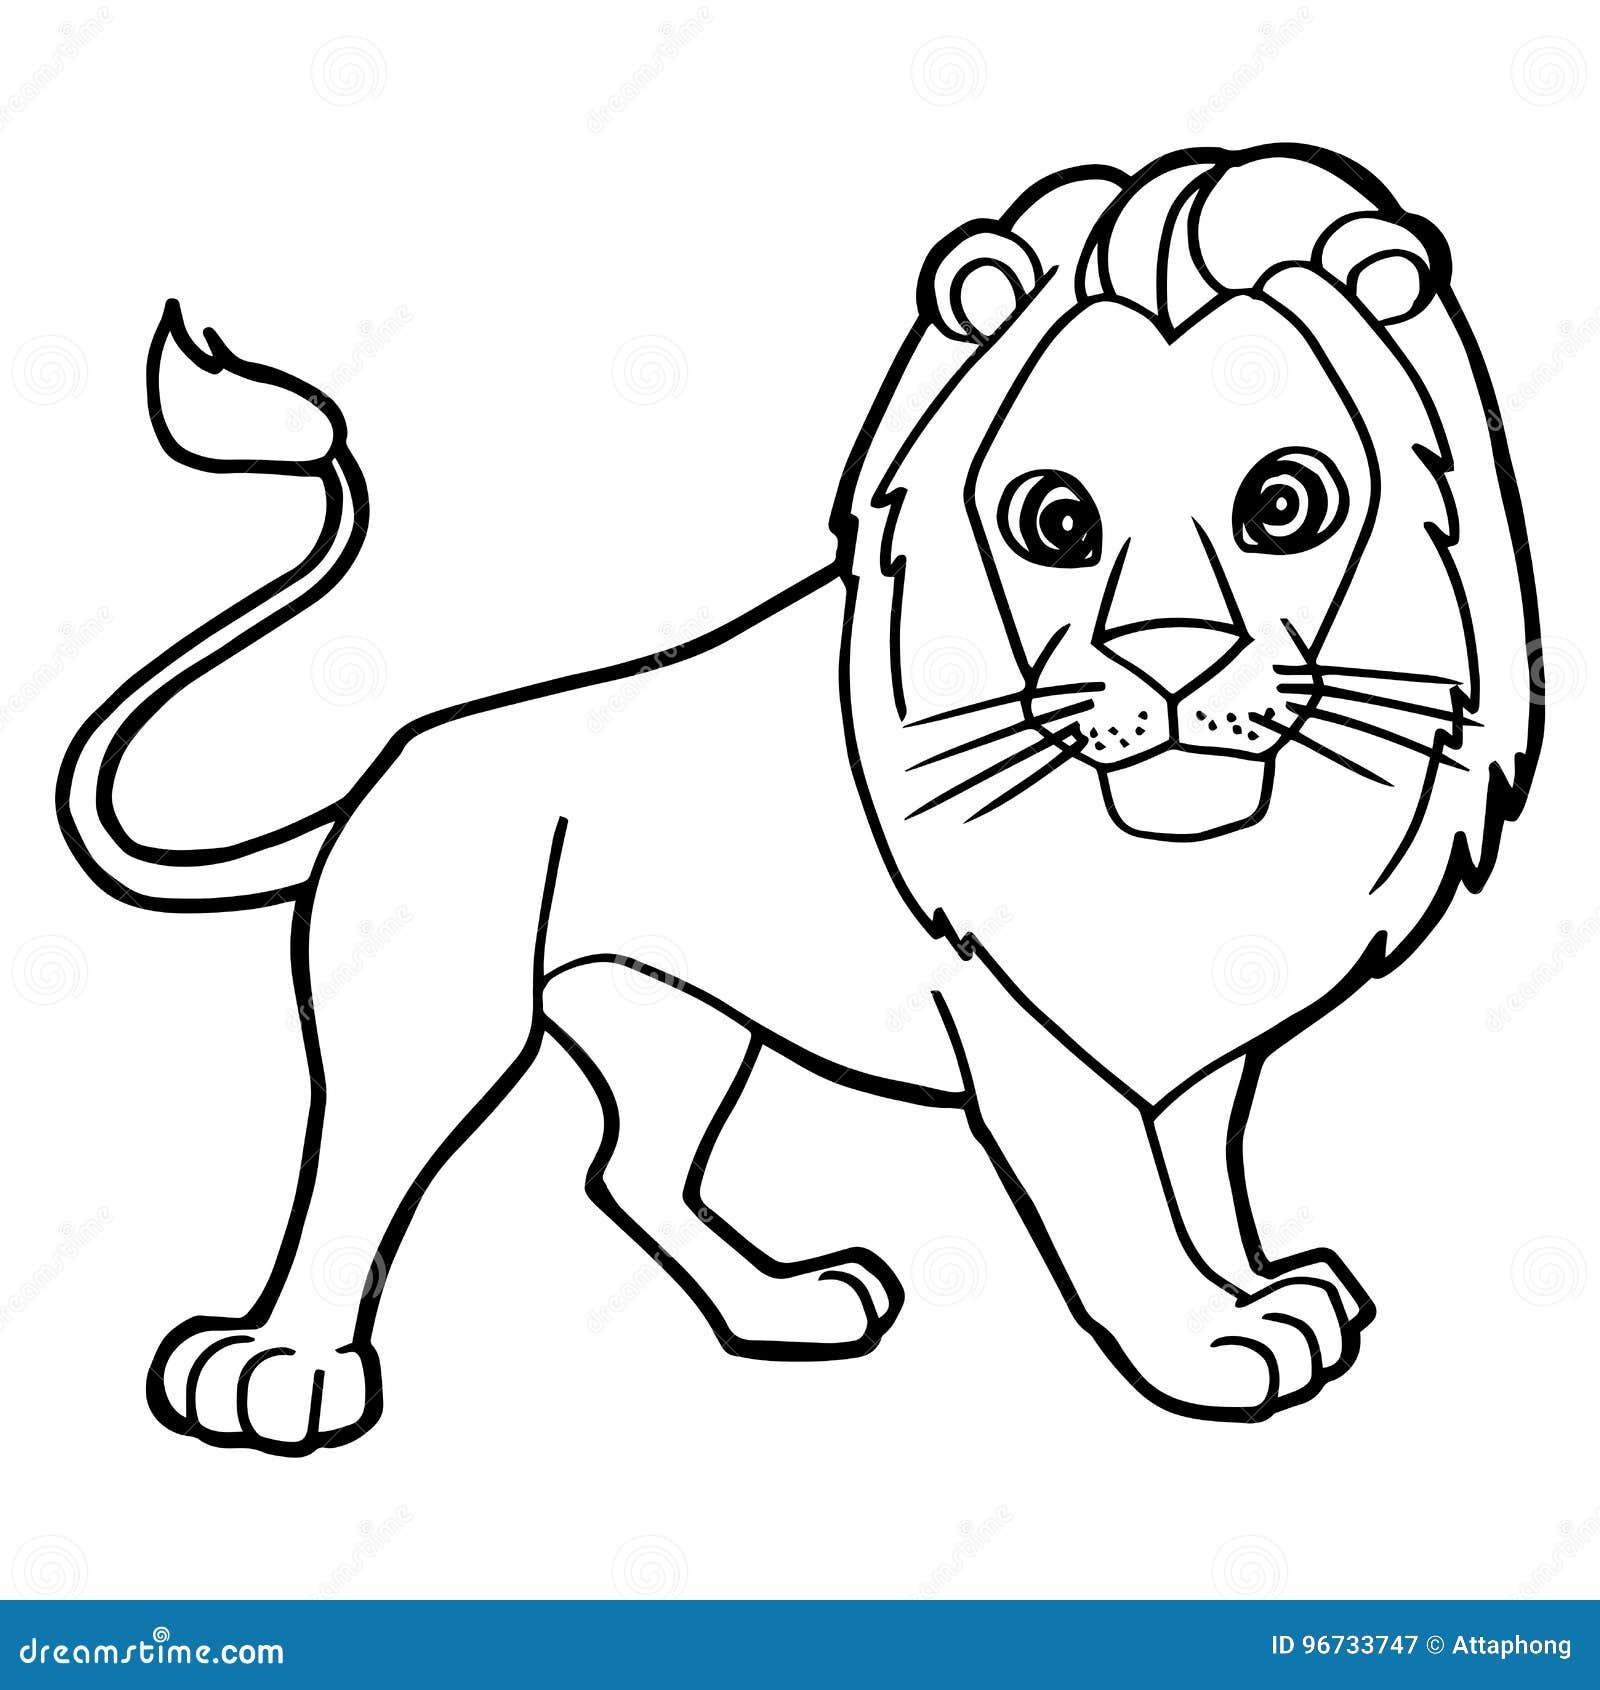 Cartoon Cute Lion Coloring Page Vector Stock Vector Illustration